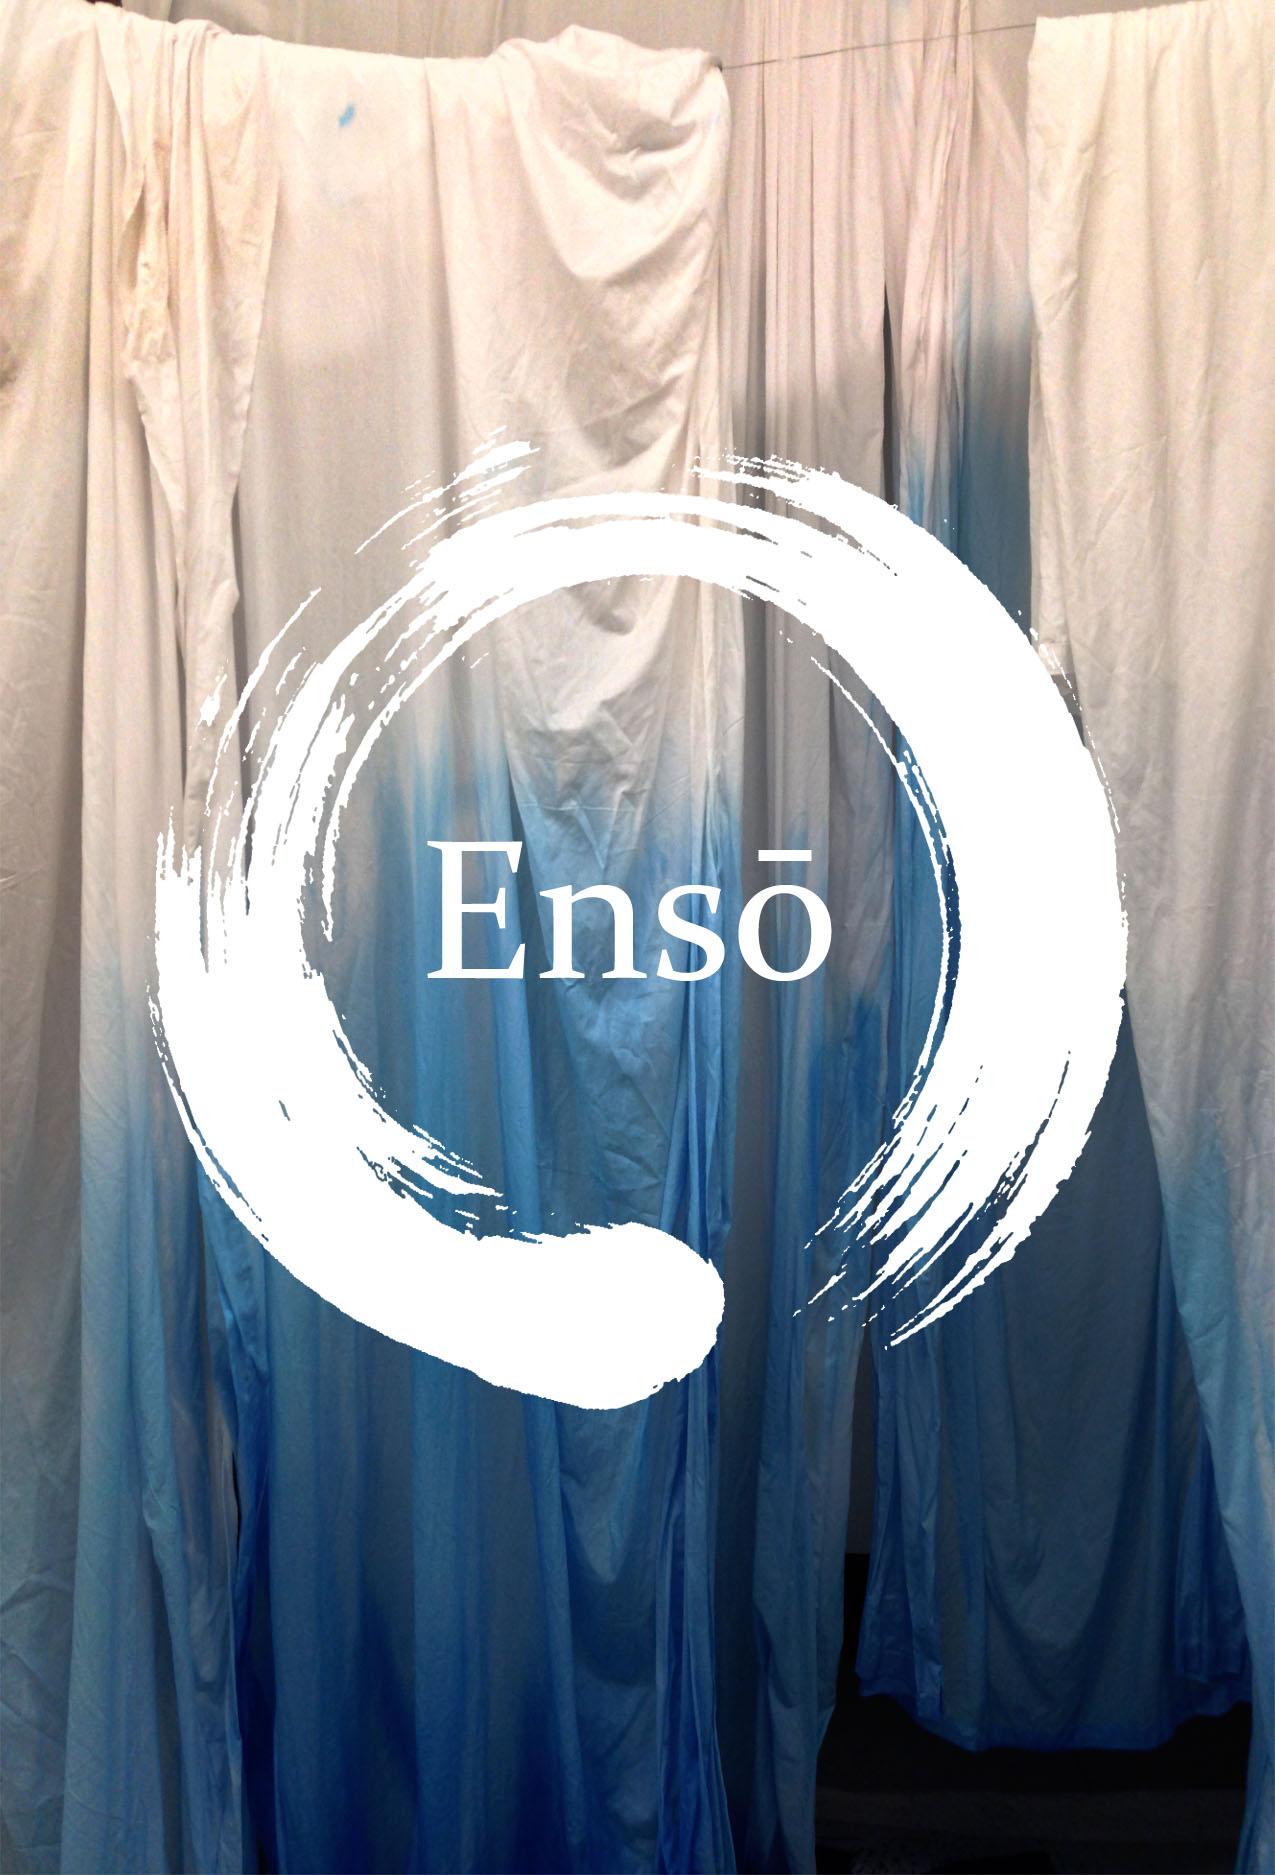 Enso_frontcard_2014.jpg